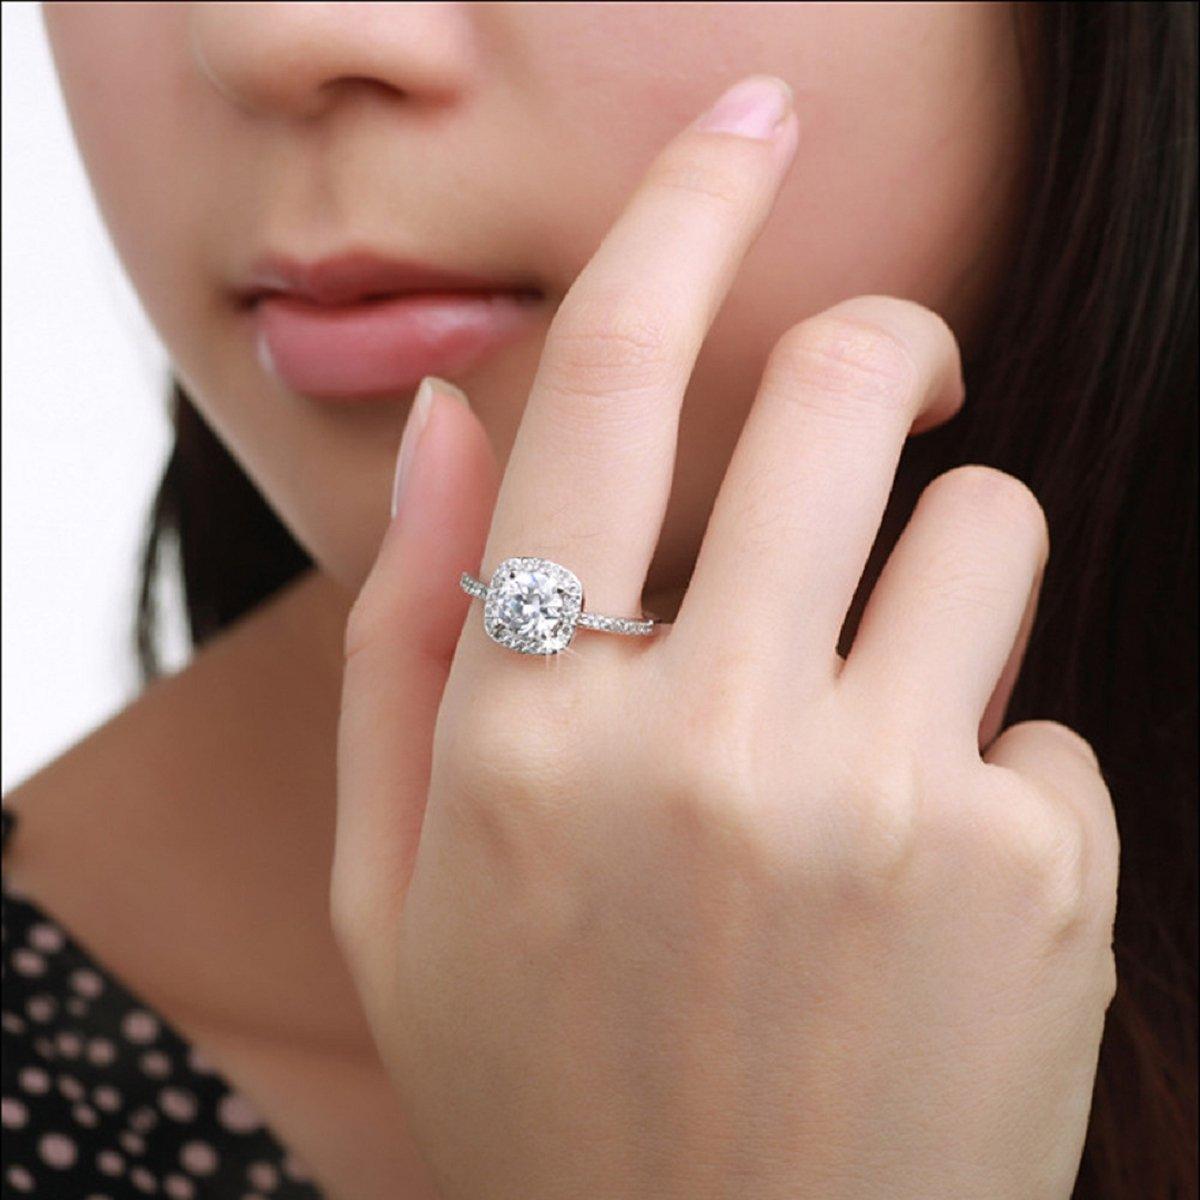 Amazoncom Ularmo 2015 Womens Shinning Big Square Stone Finger